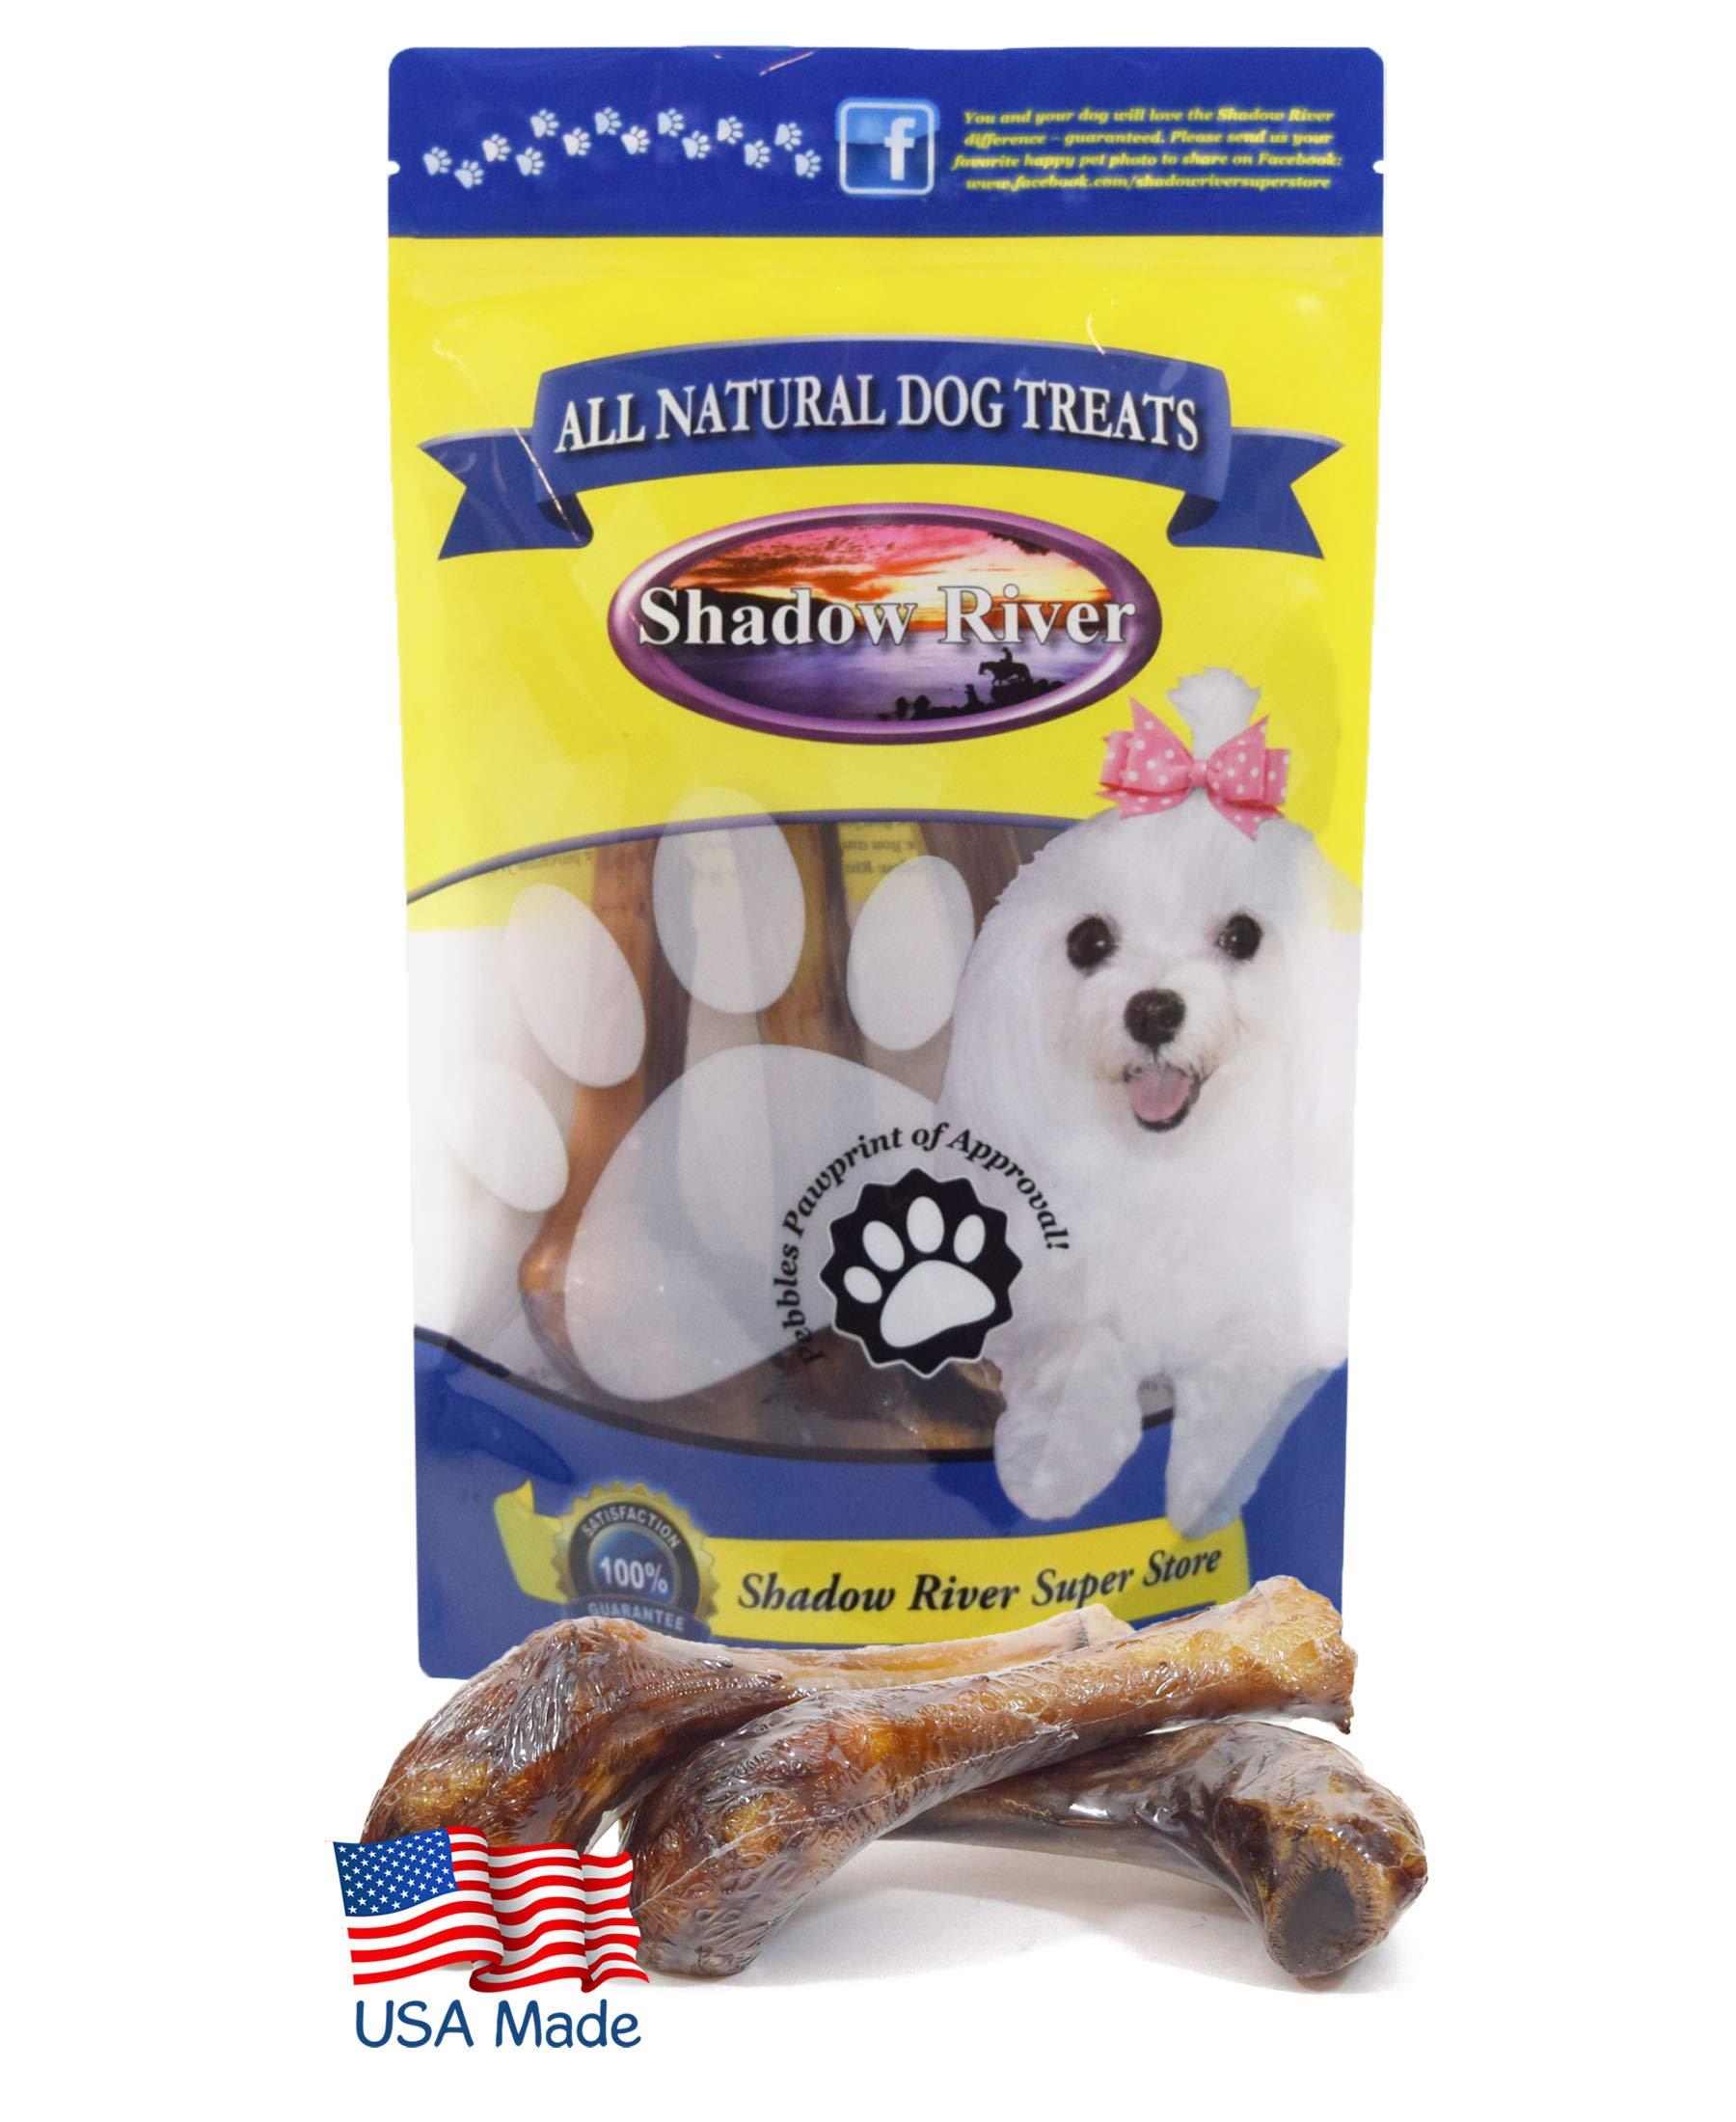 Shadow River Lamb Shank Bones for Dogs - 10 Pack Regular Size Premium All Natural Chew Treats